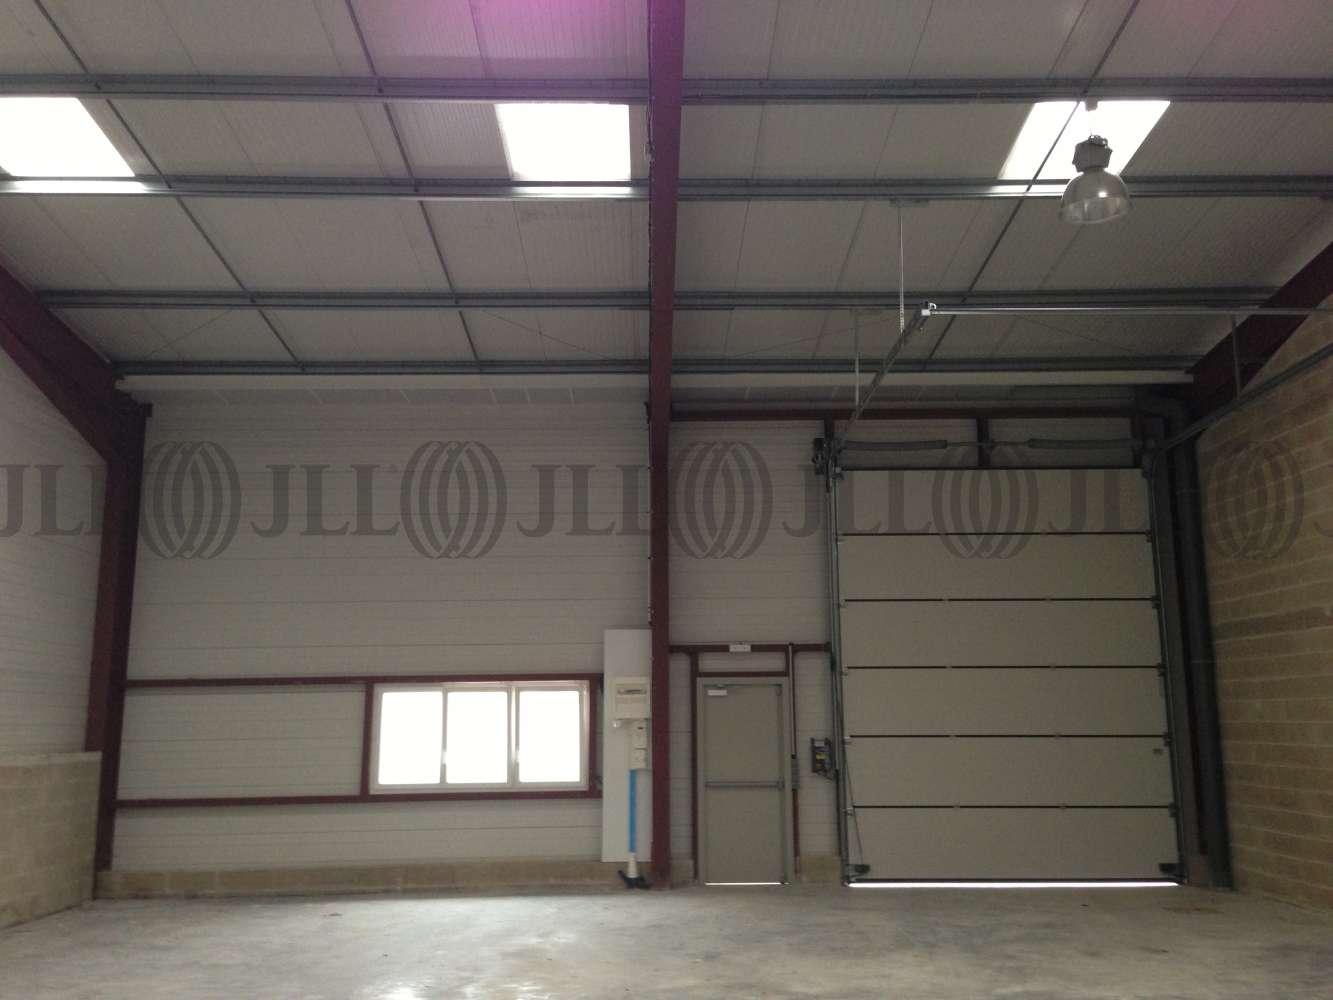 Activités/entrepôt Champfleury, 51500 - CHAMPFLEURY - 488694